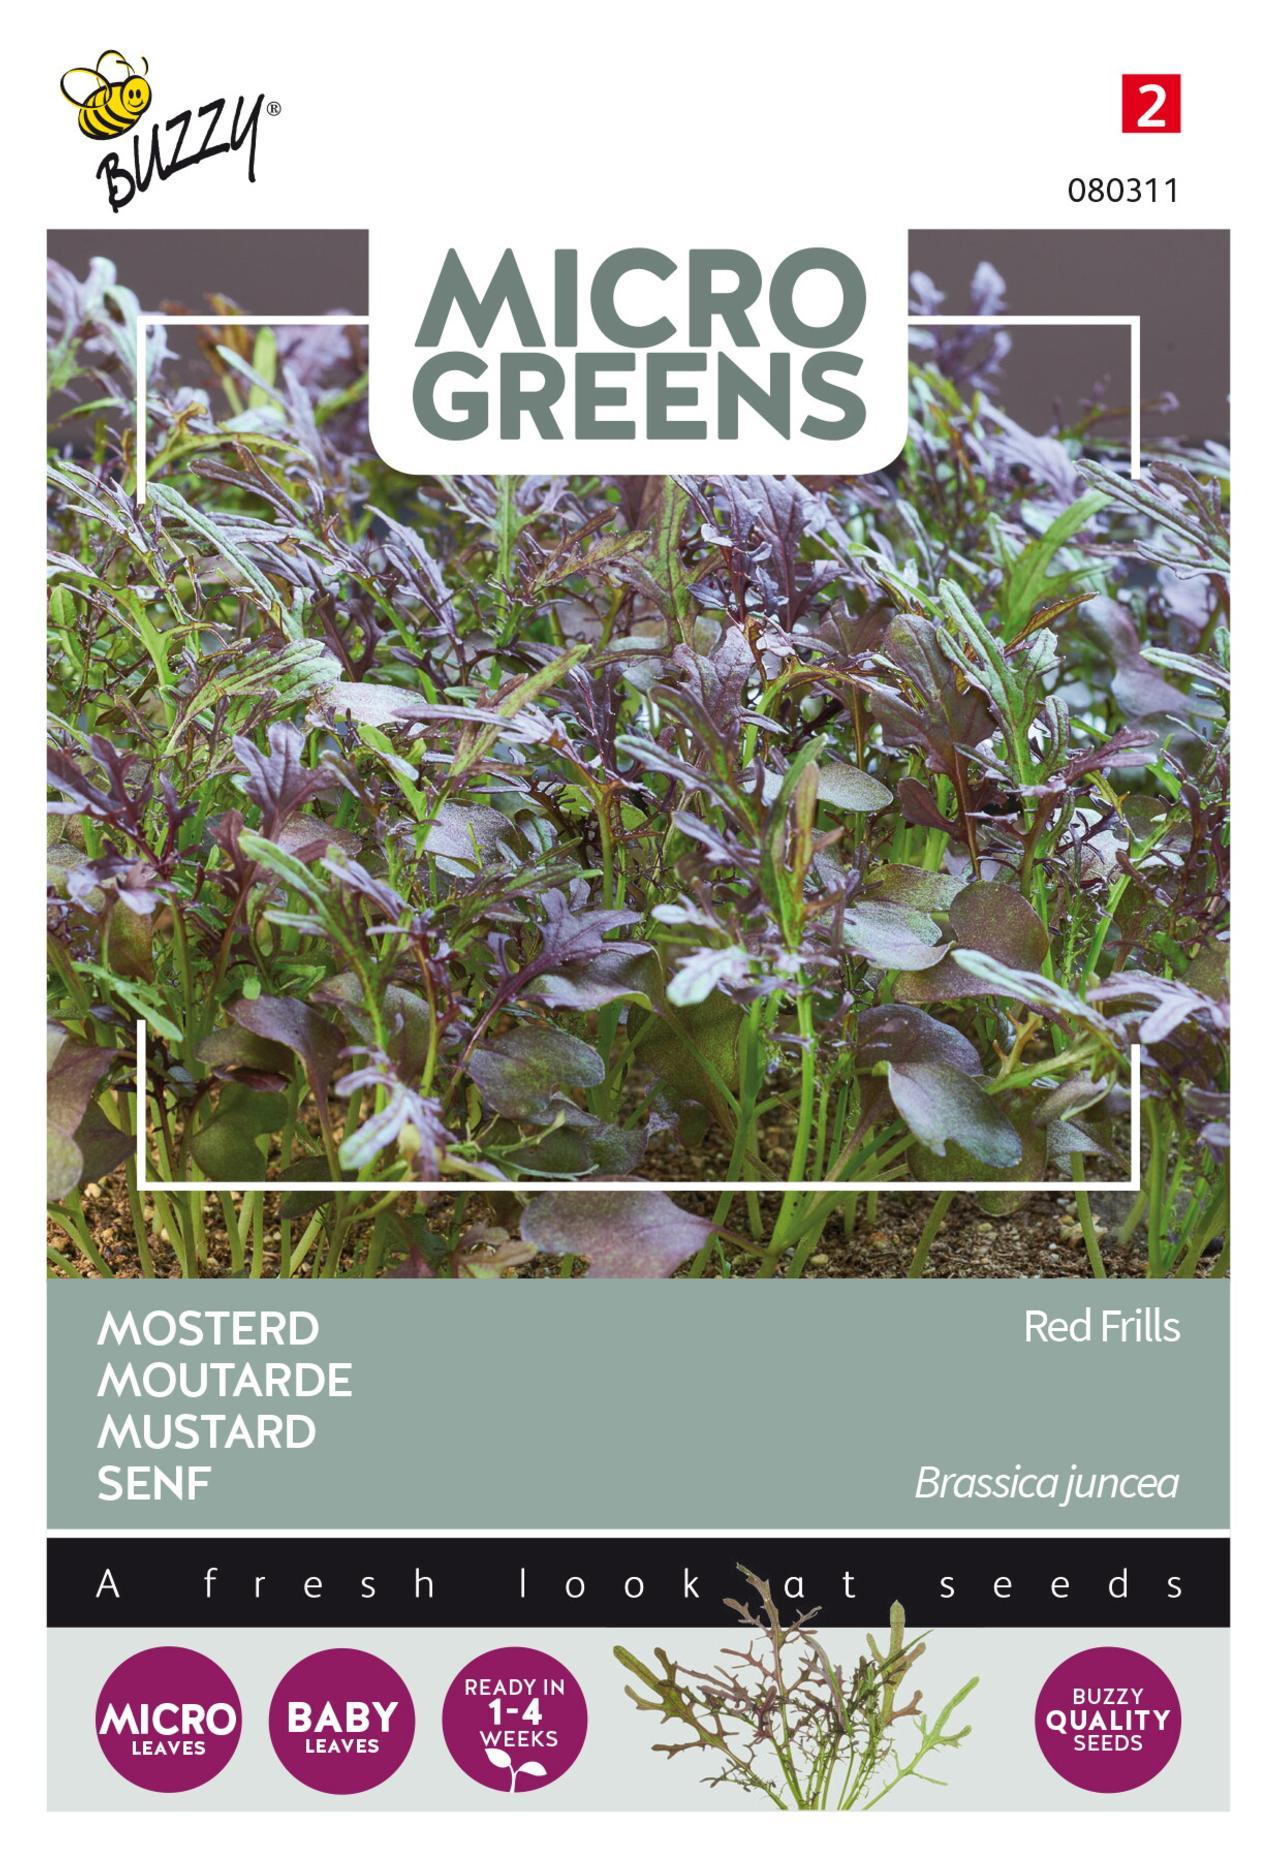 Brassica juncea 'Red Frills' (microgreens) plant